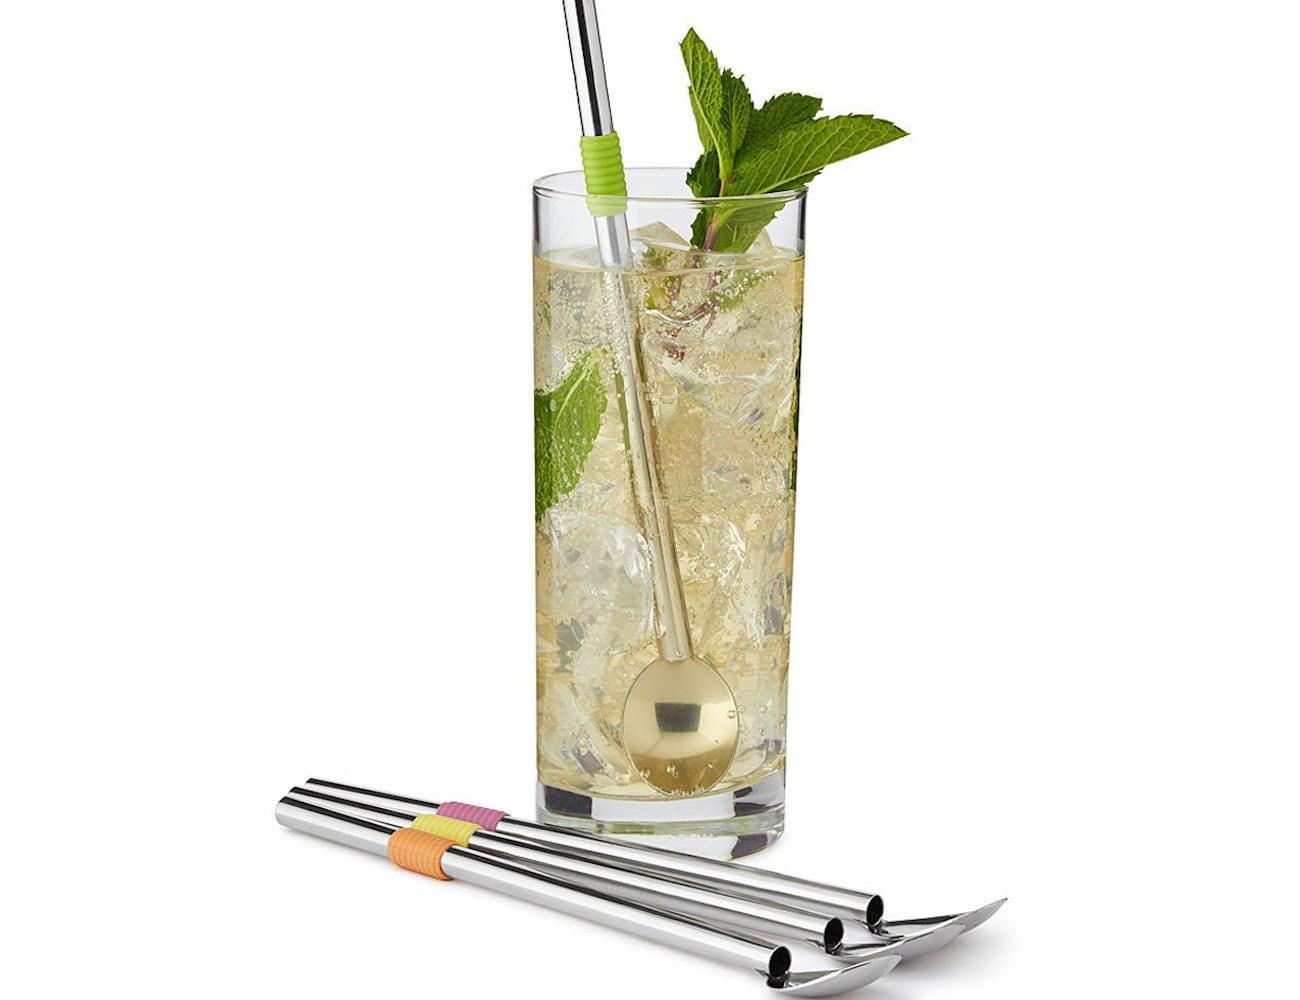 Endurance Stainless Steel Spoon Straws eliminate plastic straws